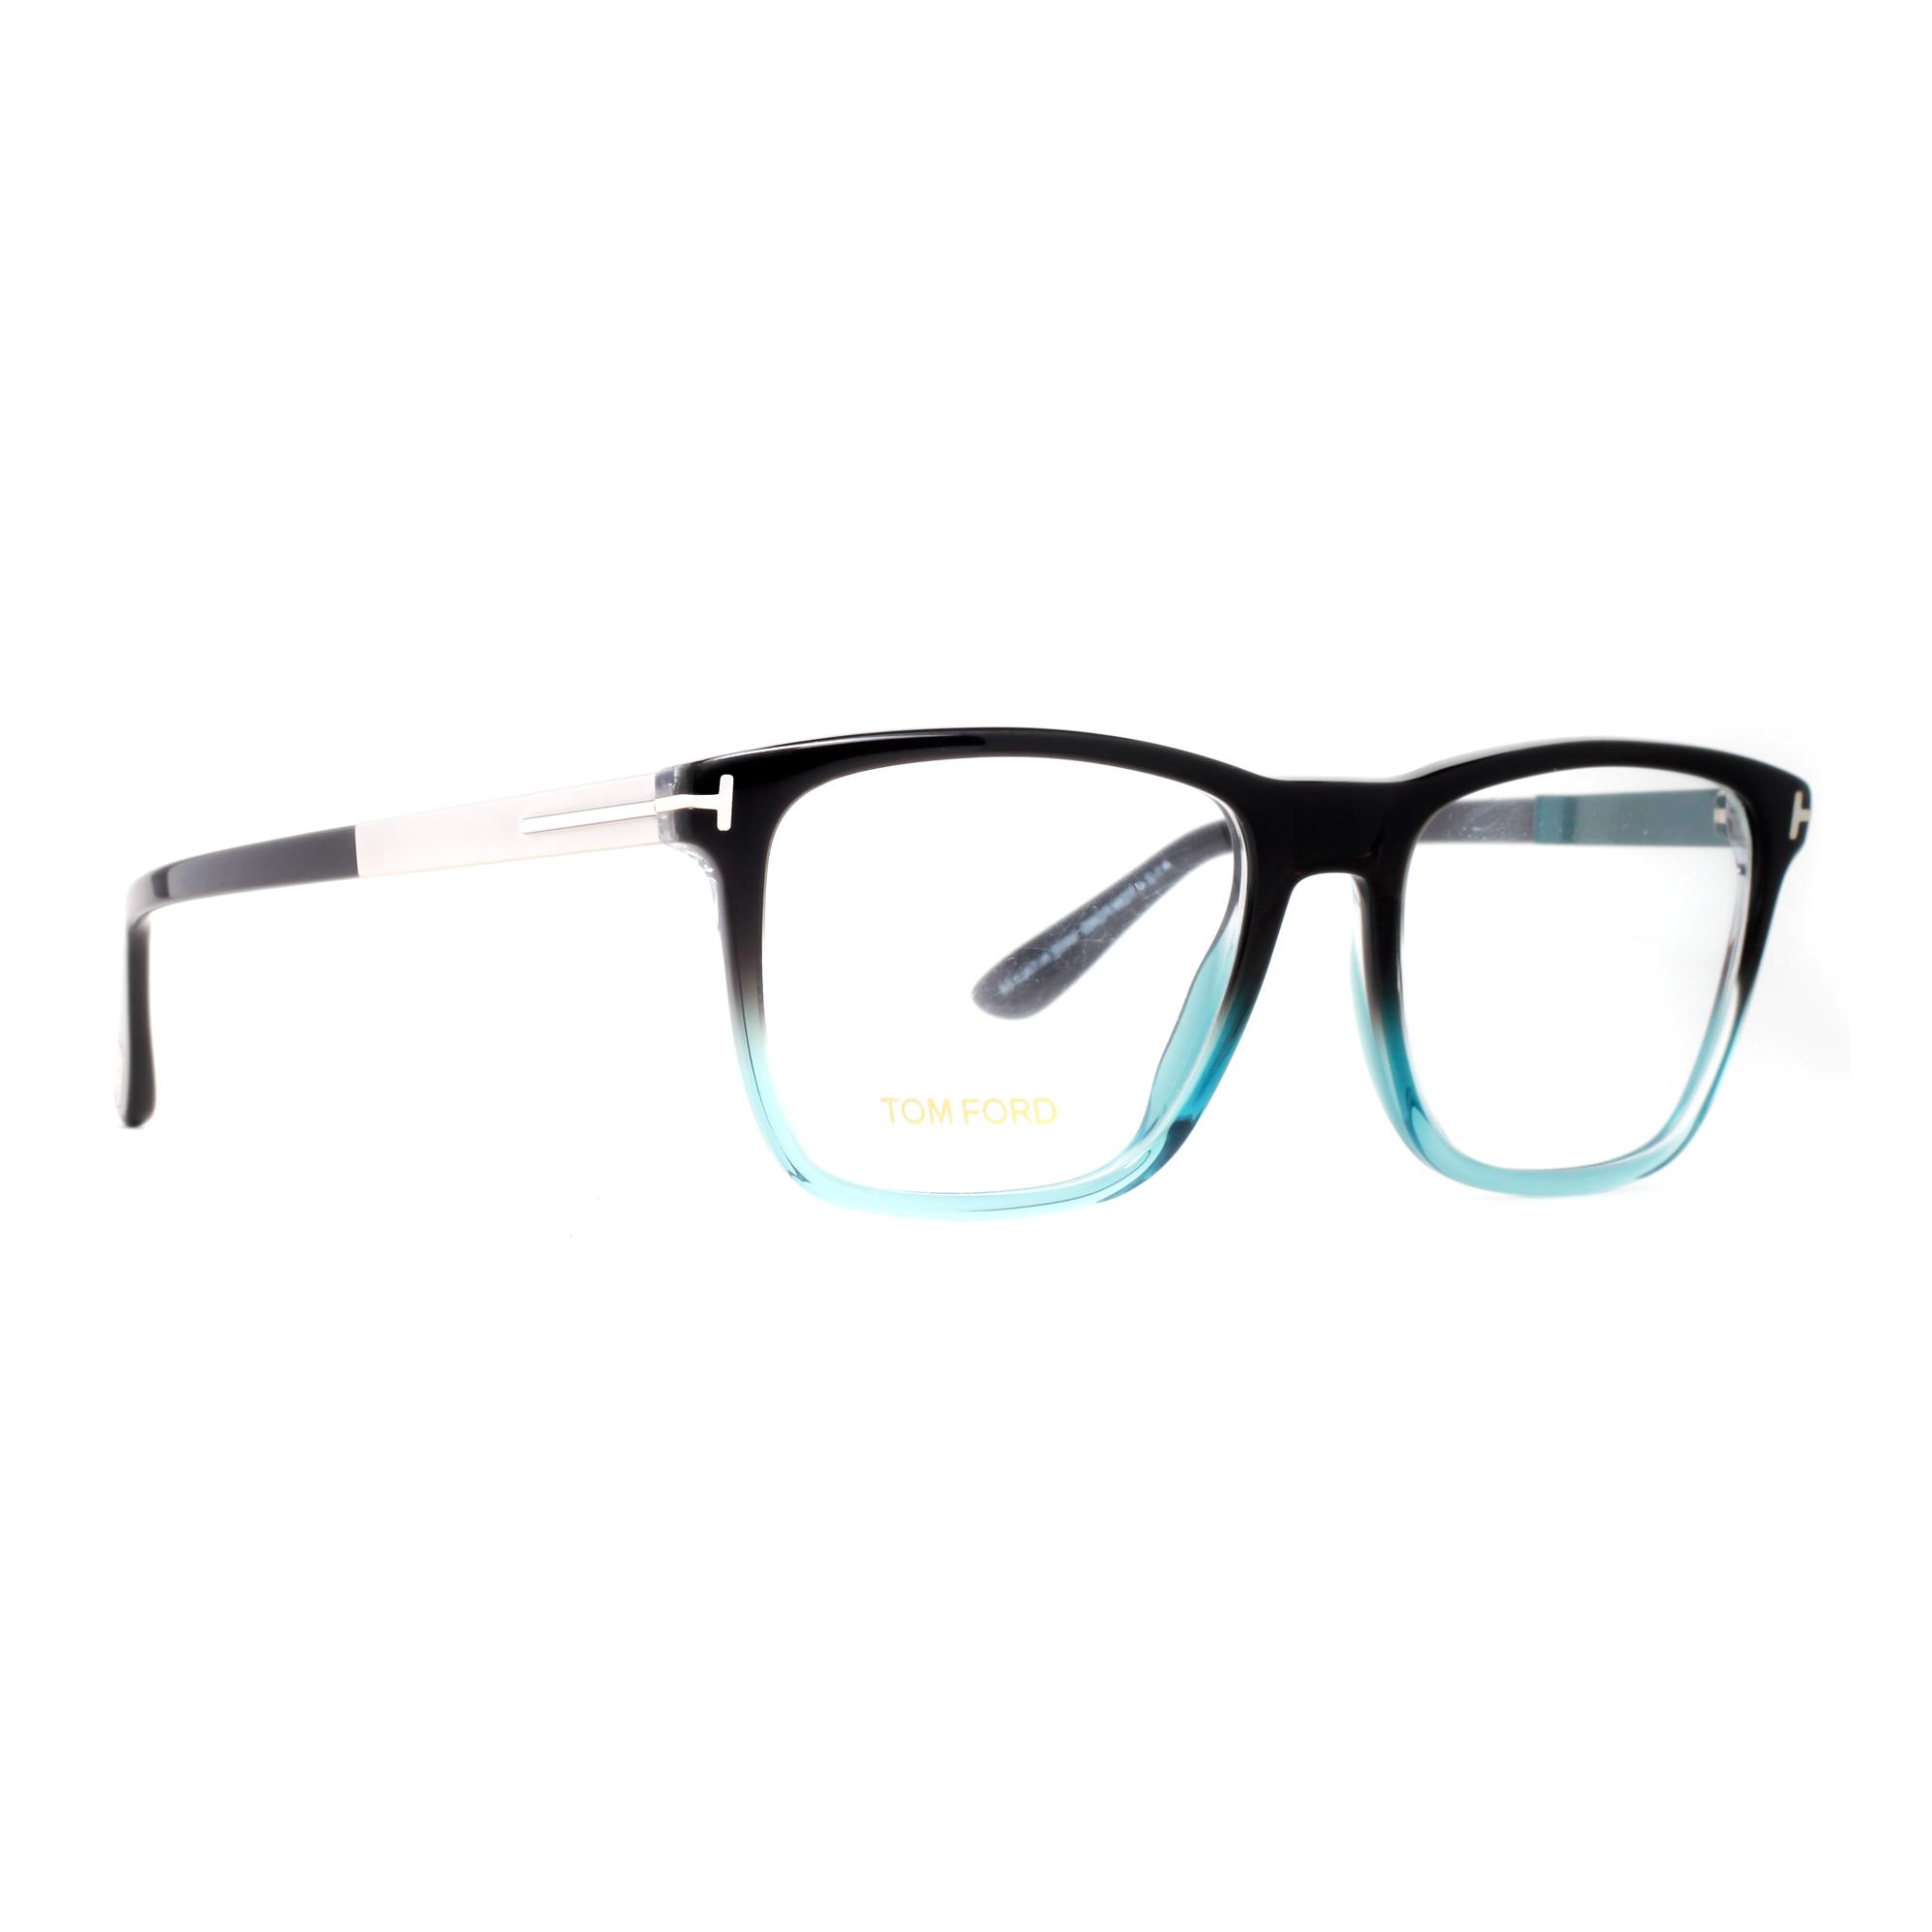 Aqua Blue Glasses Frames : Tom Ford TF 5351 05A Black/Clear Aqua Blue/Gunmetal Mens ...